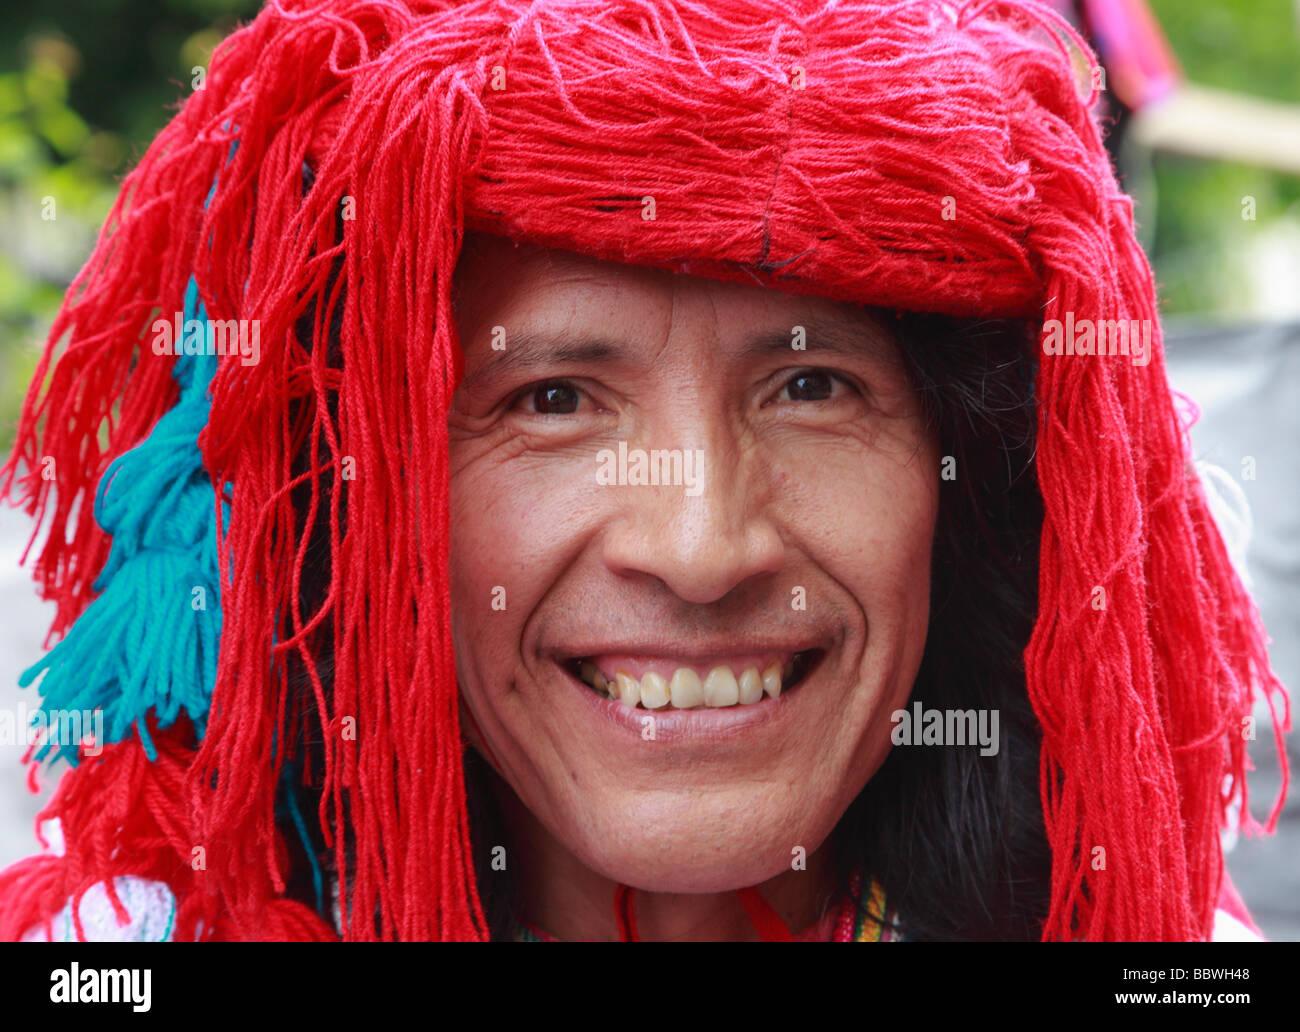 Deutschland Berlin Karneval der Kulturen South American Mann im Kostüm Stockbild